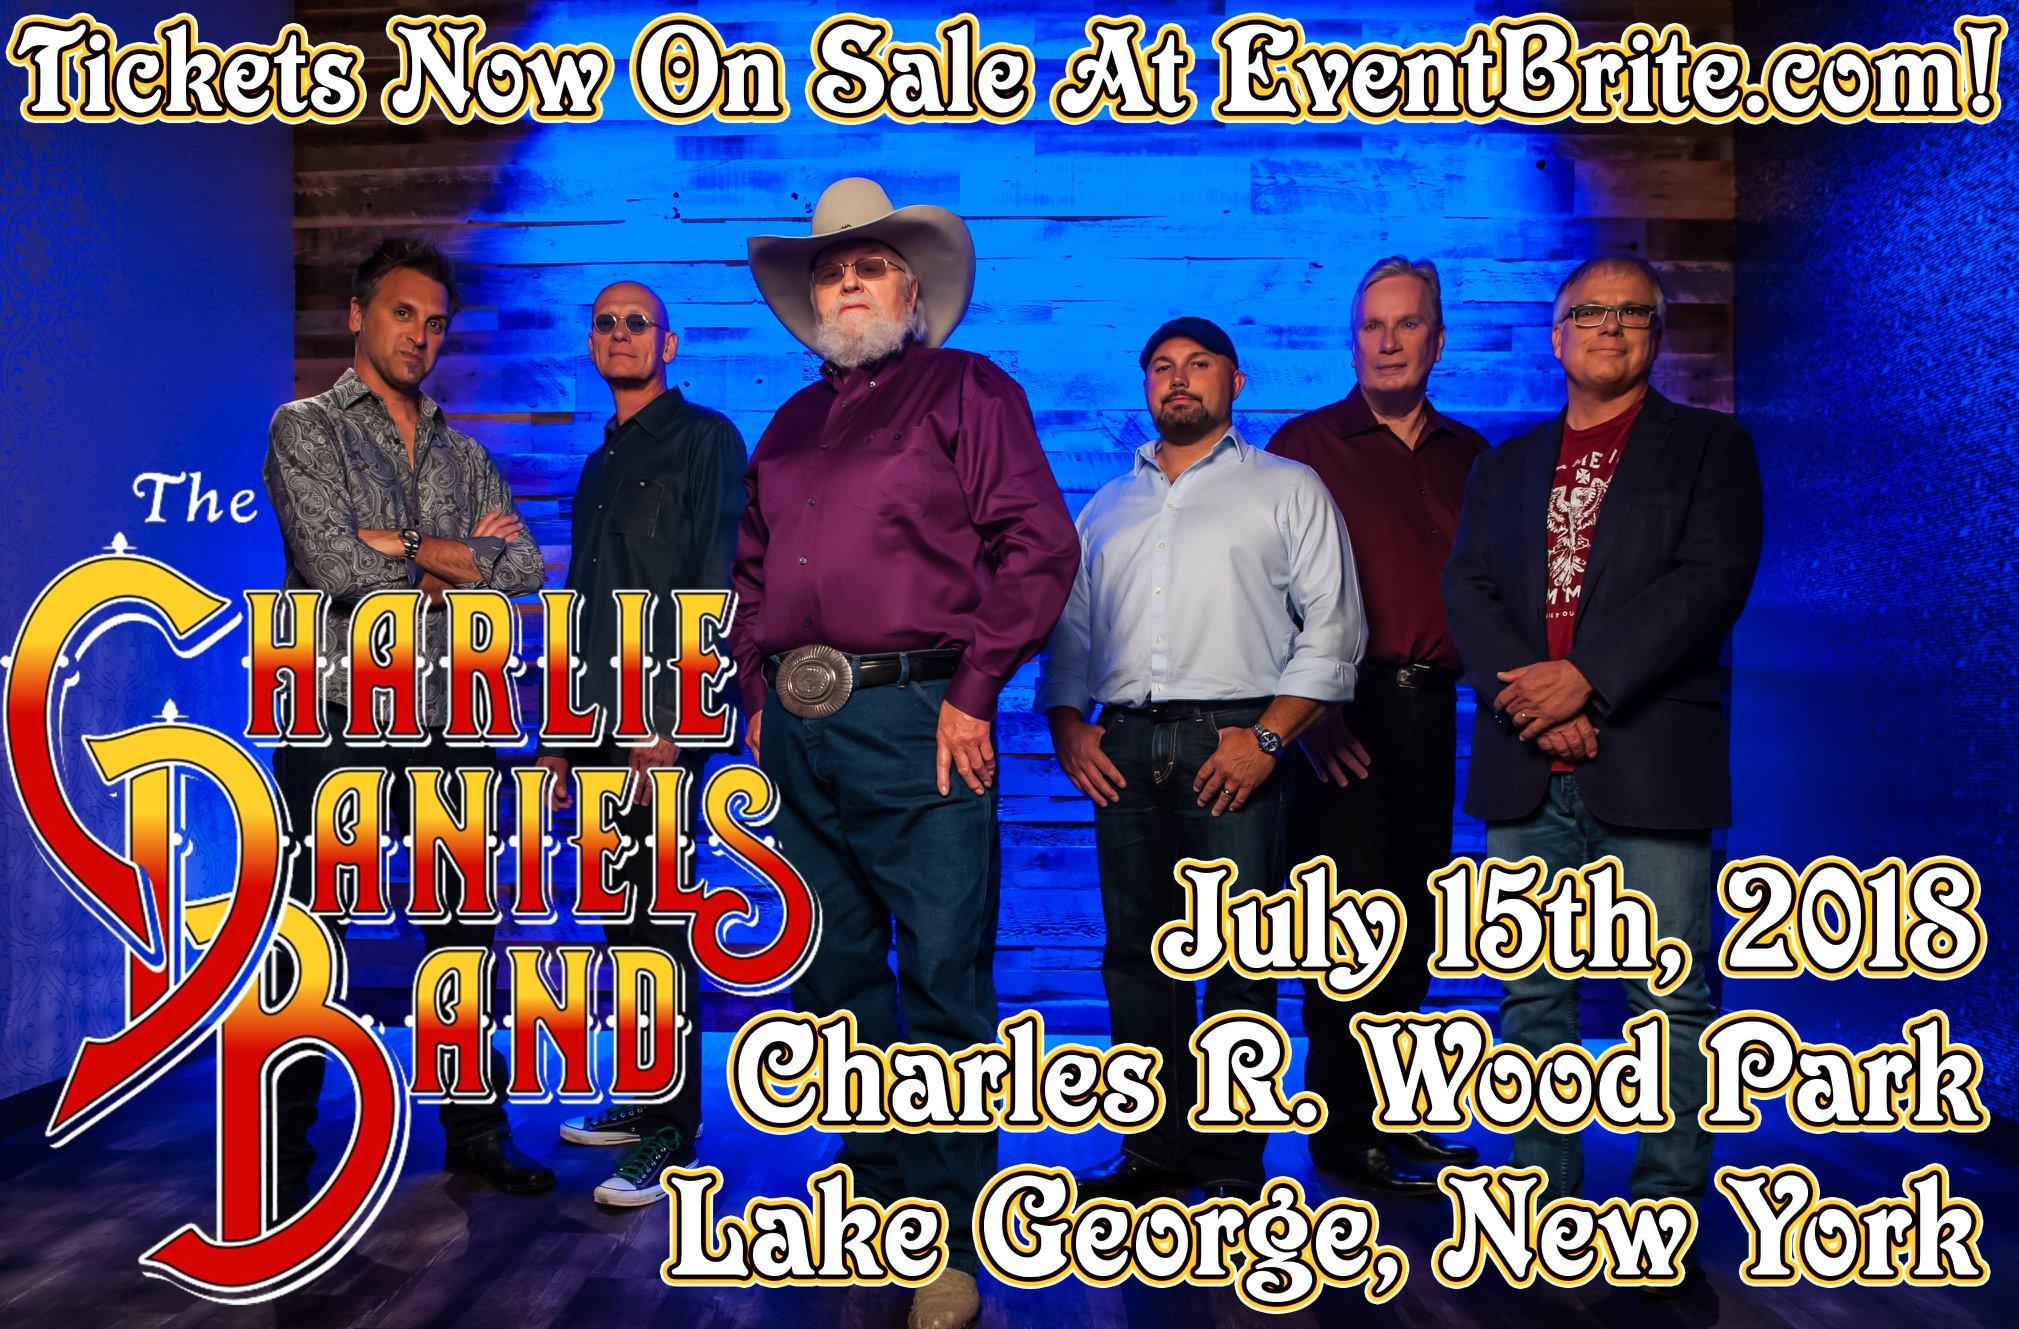 Charlie Daniels Band To Play Lake George, New York